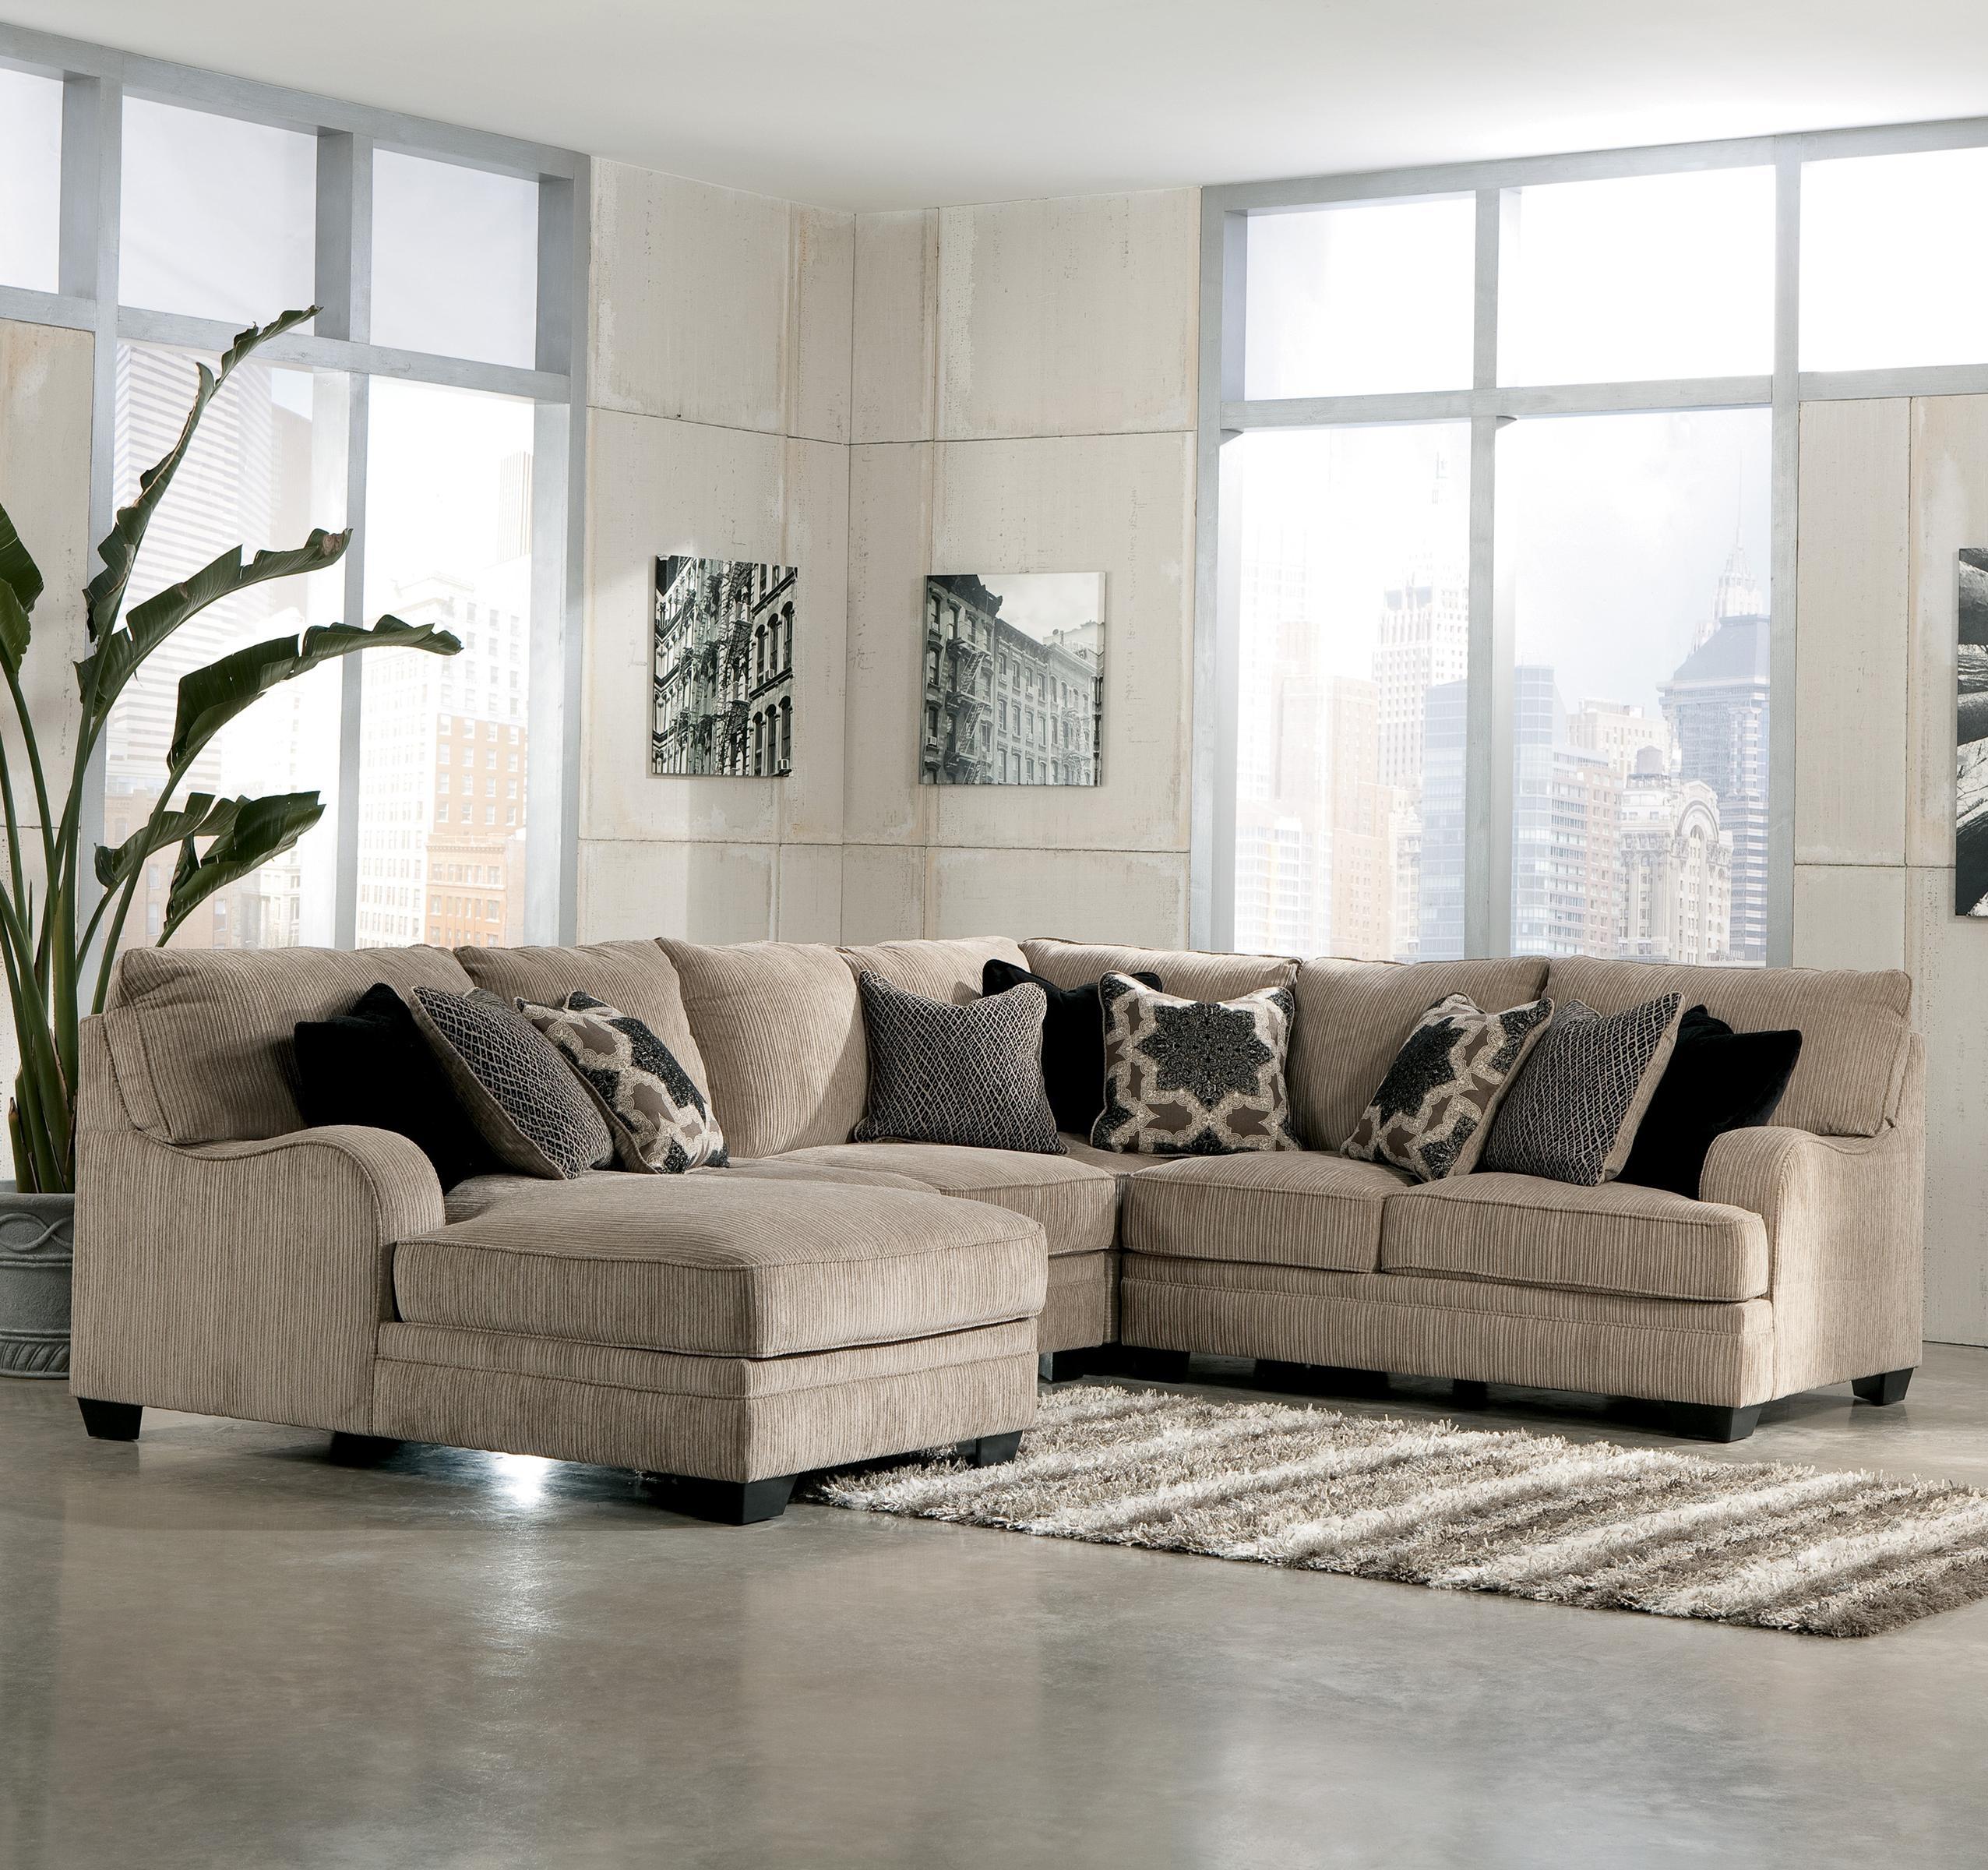 Signature Designashley Katisha - Platinum 4-Piece Sectional Sofa regarding Peterborough Ontario Sectional Sofas (Image 8 of 10)